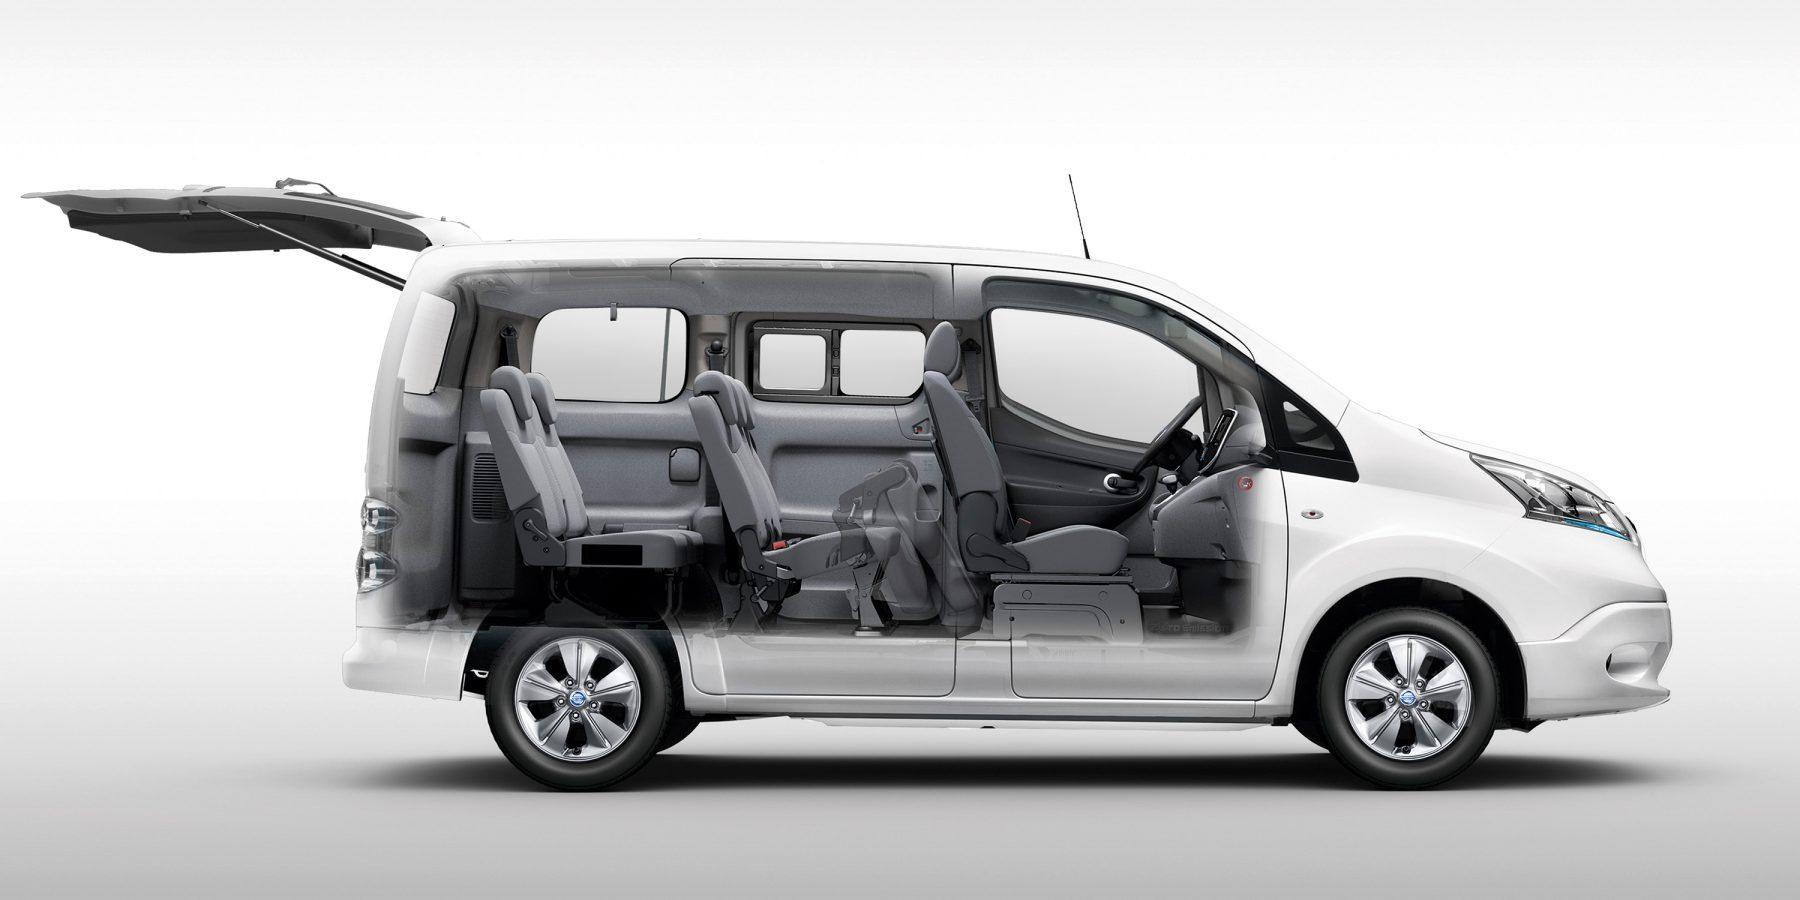 der neue nissan e-nv200 evalia – elektro familienauto 7-sitzer | nissan